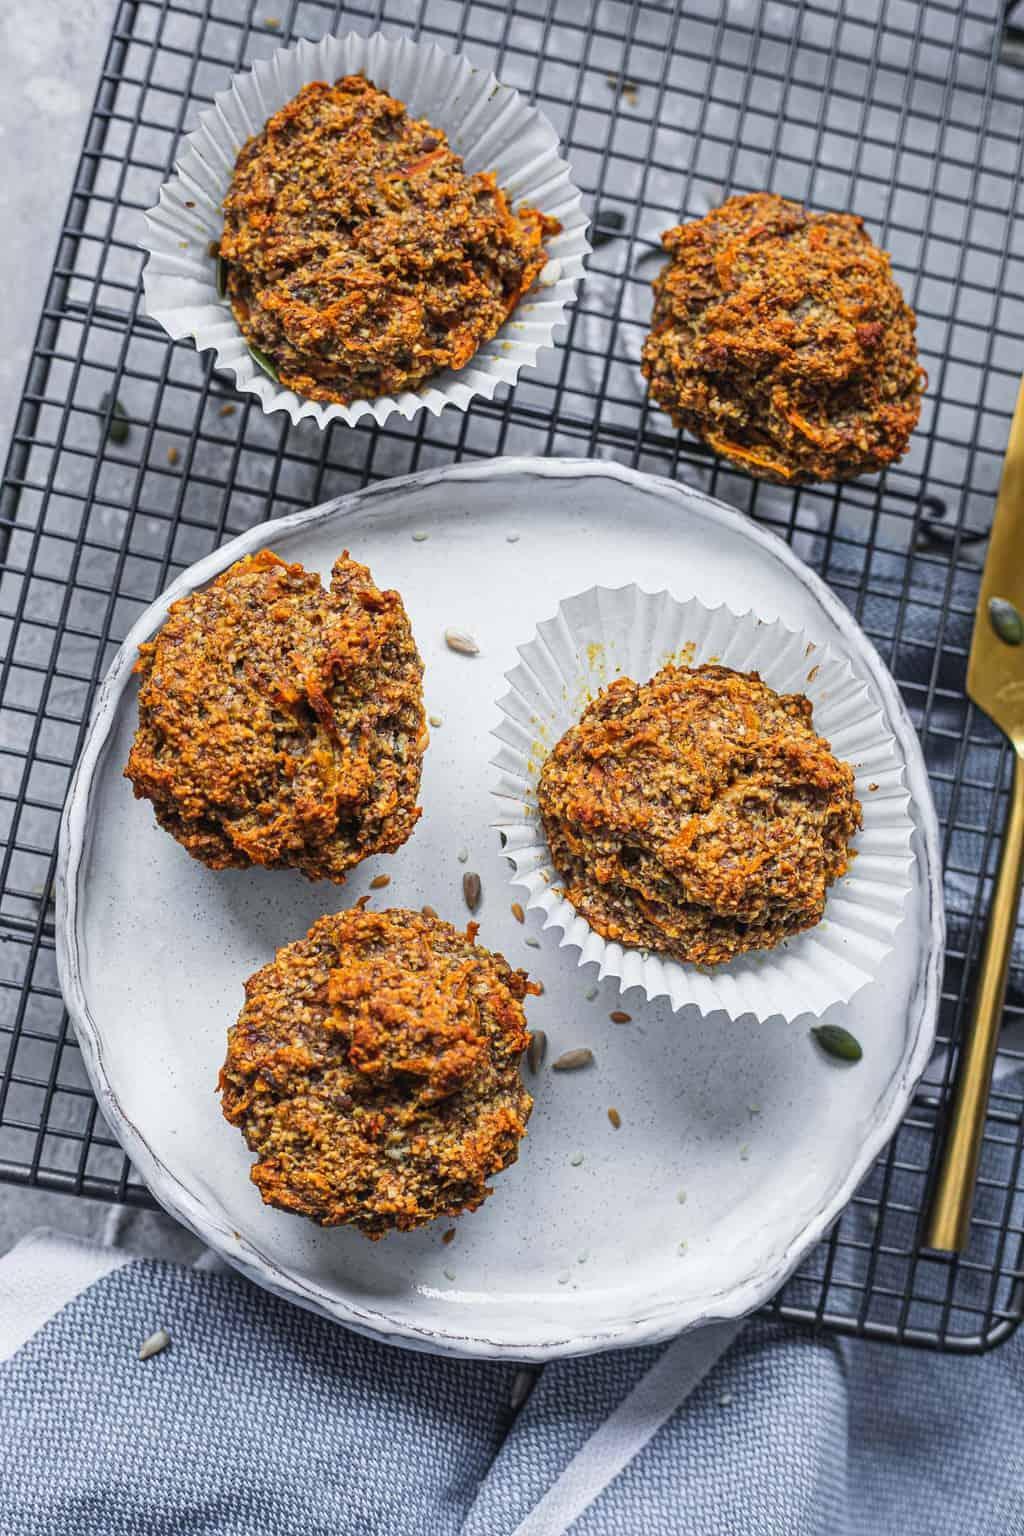 Gluten-free vegan carrot muffins